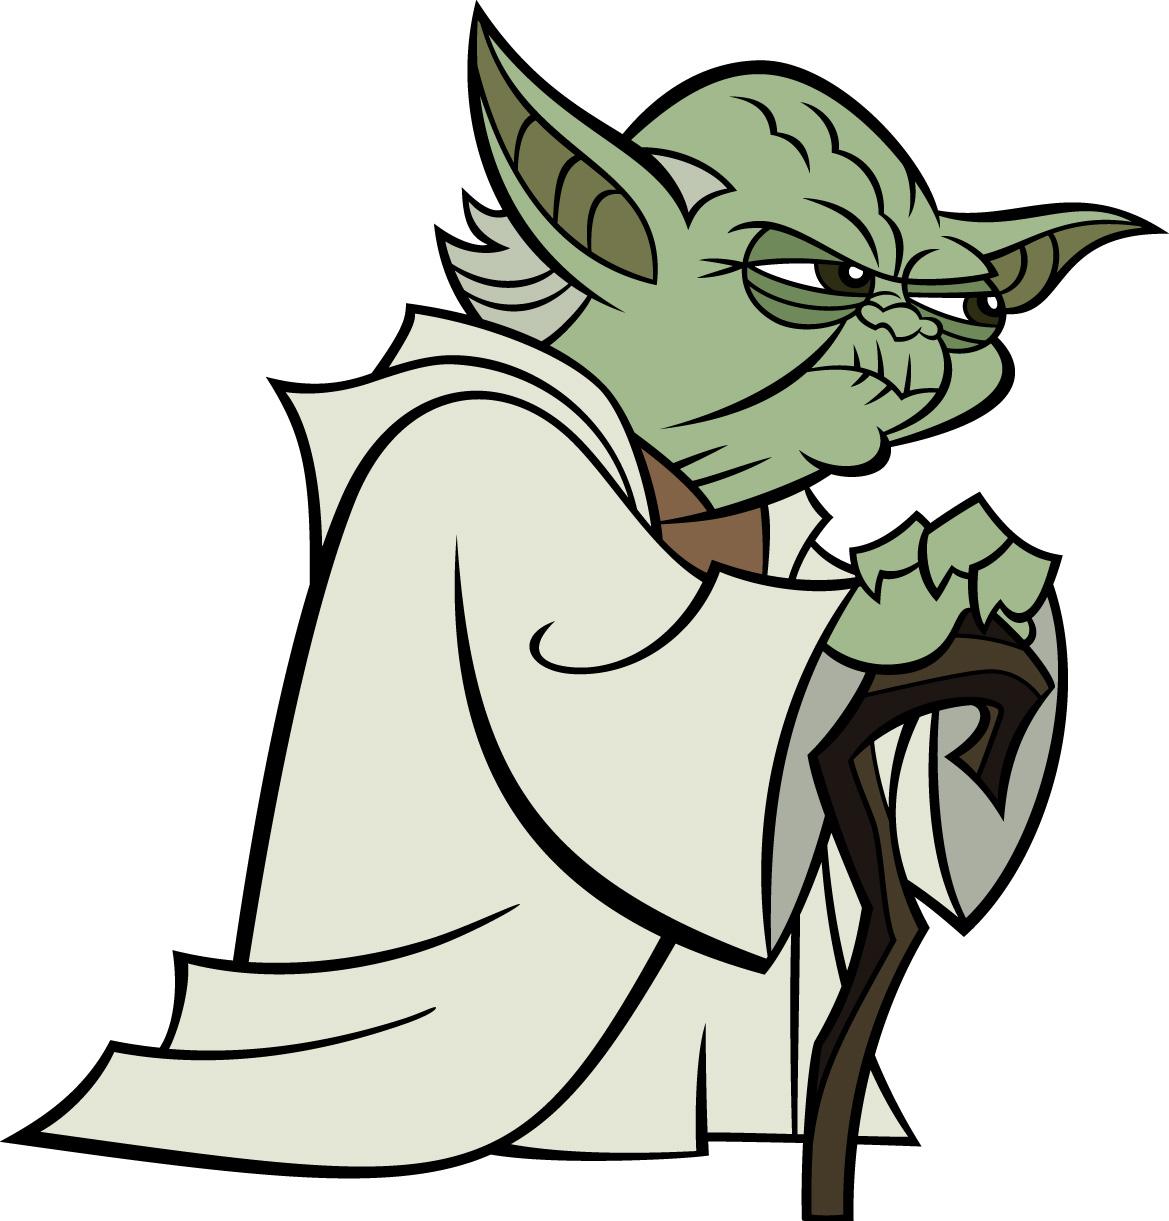 Imagen Yoda Cartoonjpg Star Wars Wiki clipart free image.